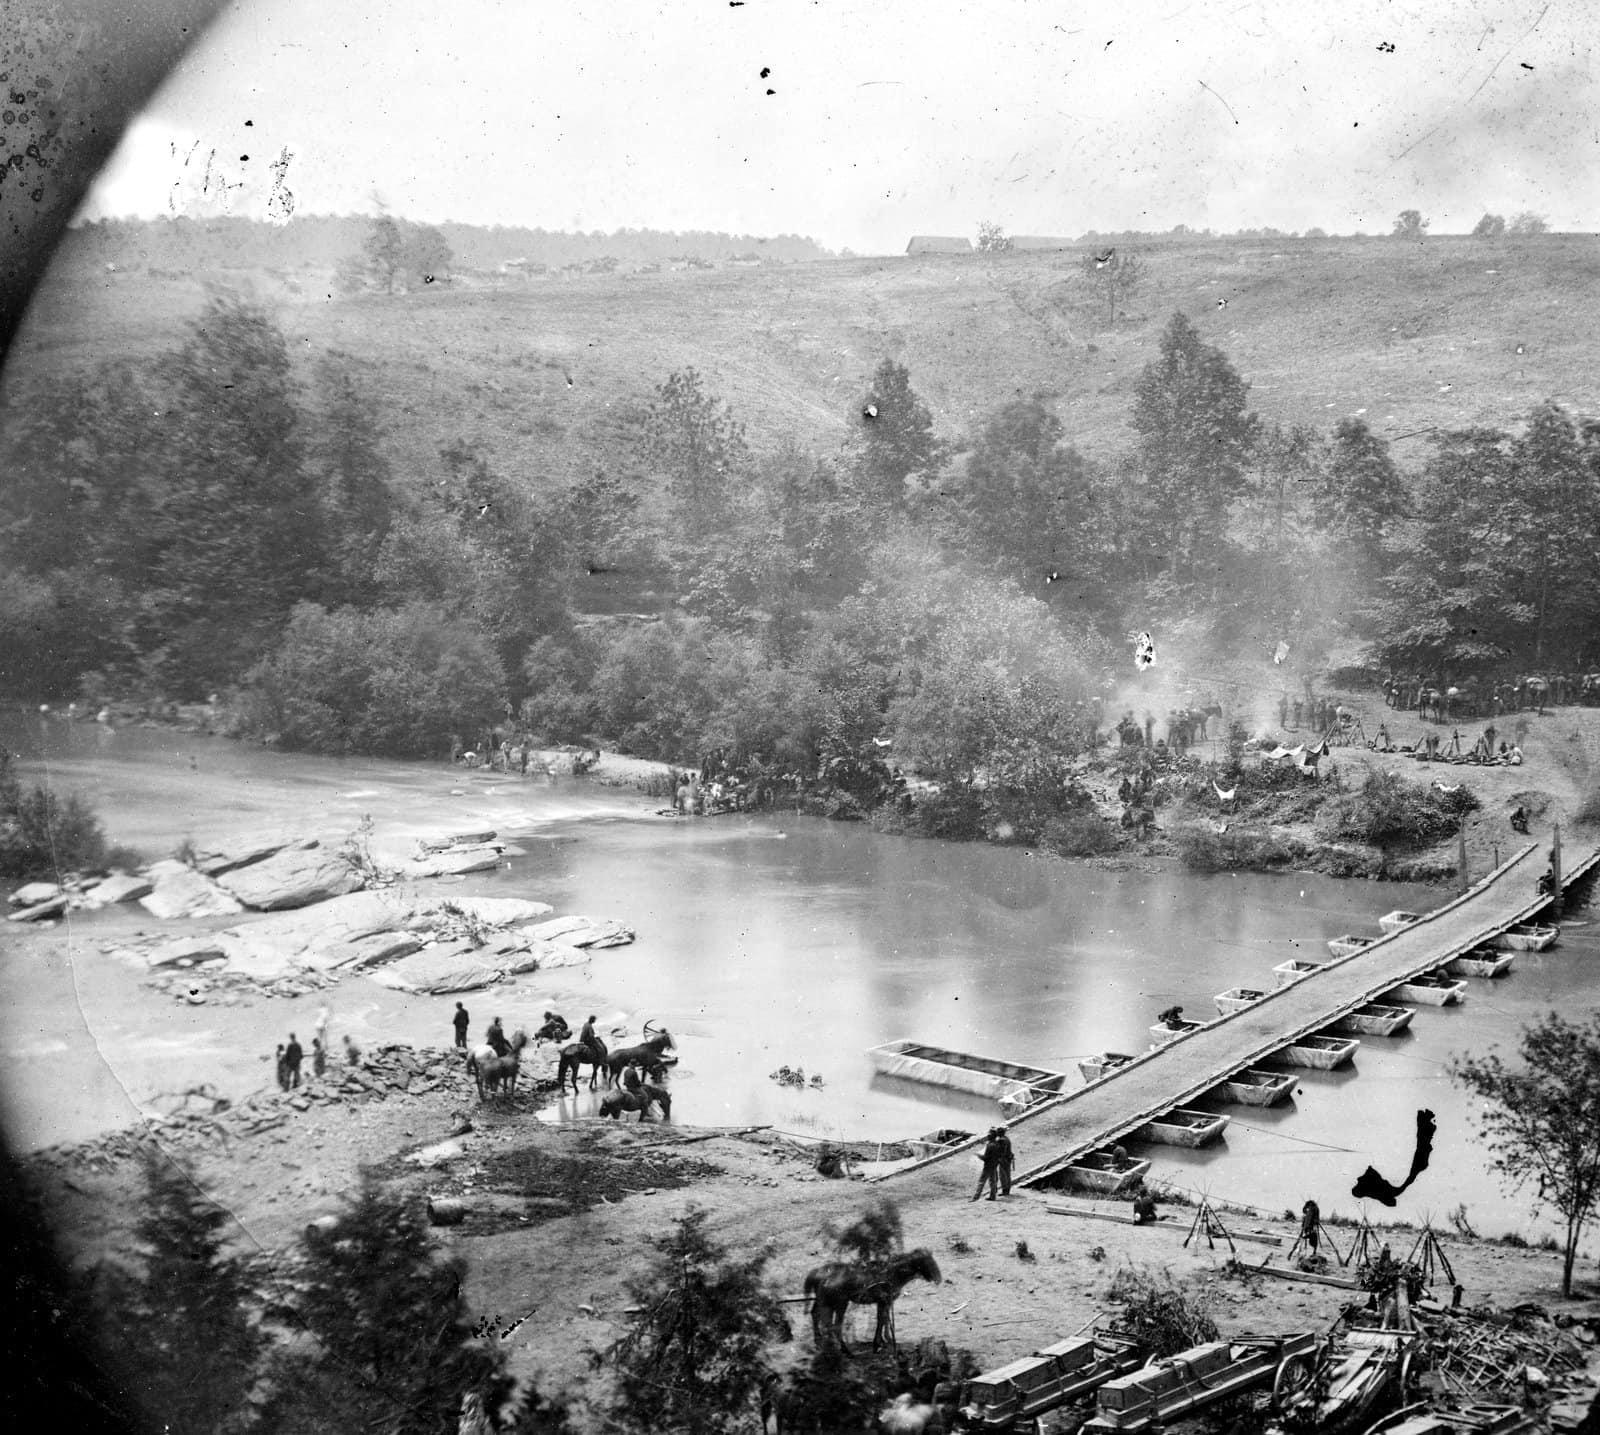 Scenes from Civil War Battle of the Wilderness (3)